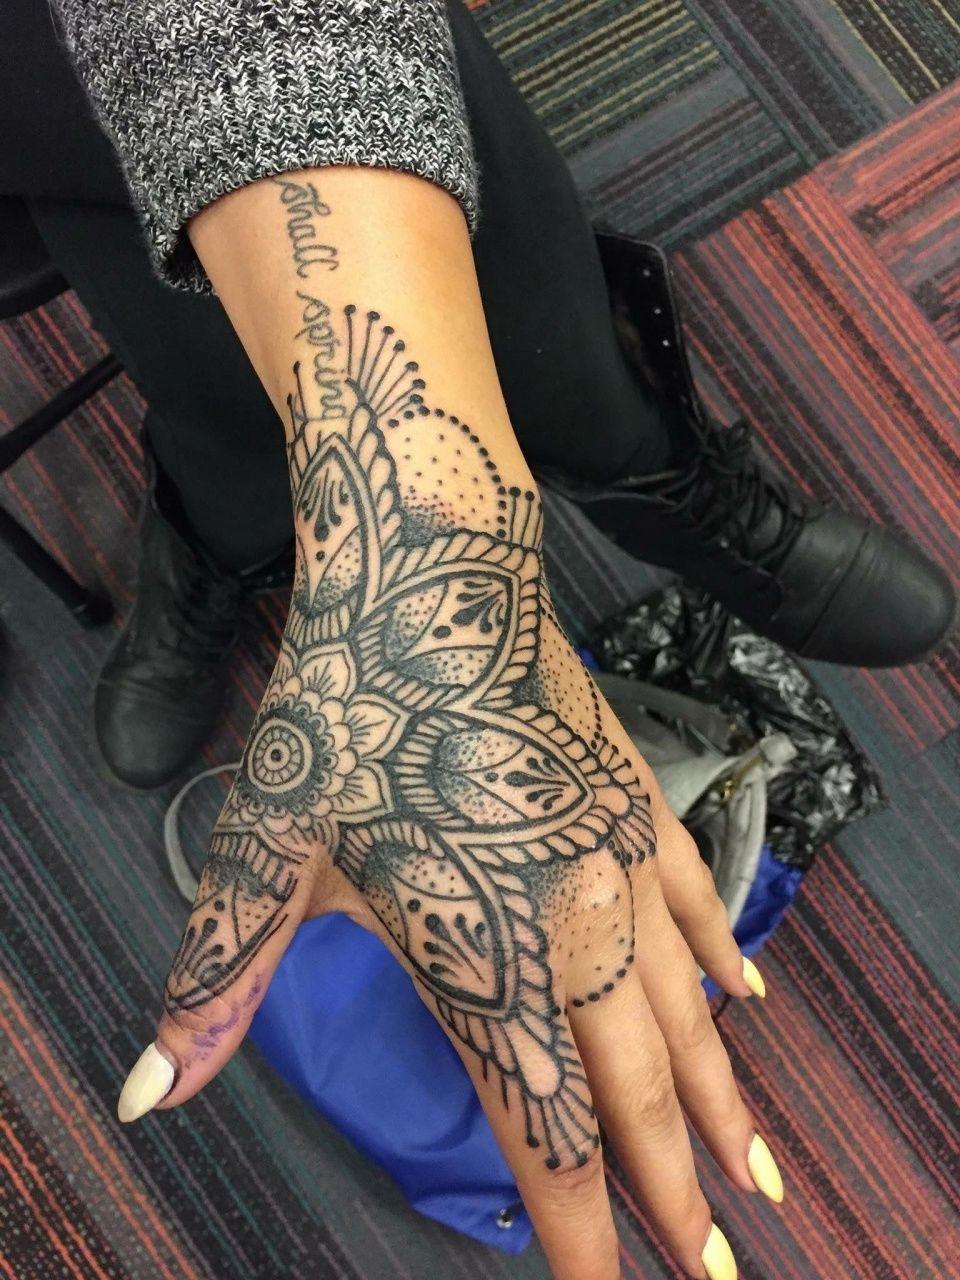 Rihanna Hand Tattoos Tribal Hand Tattoos Rihanna Hand Tattoo Side Hand Tattoos